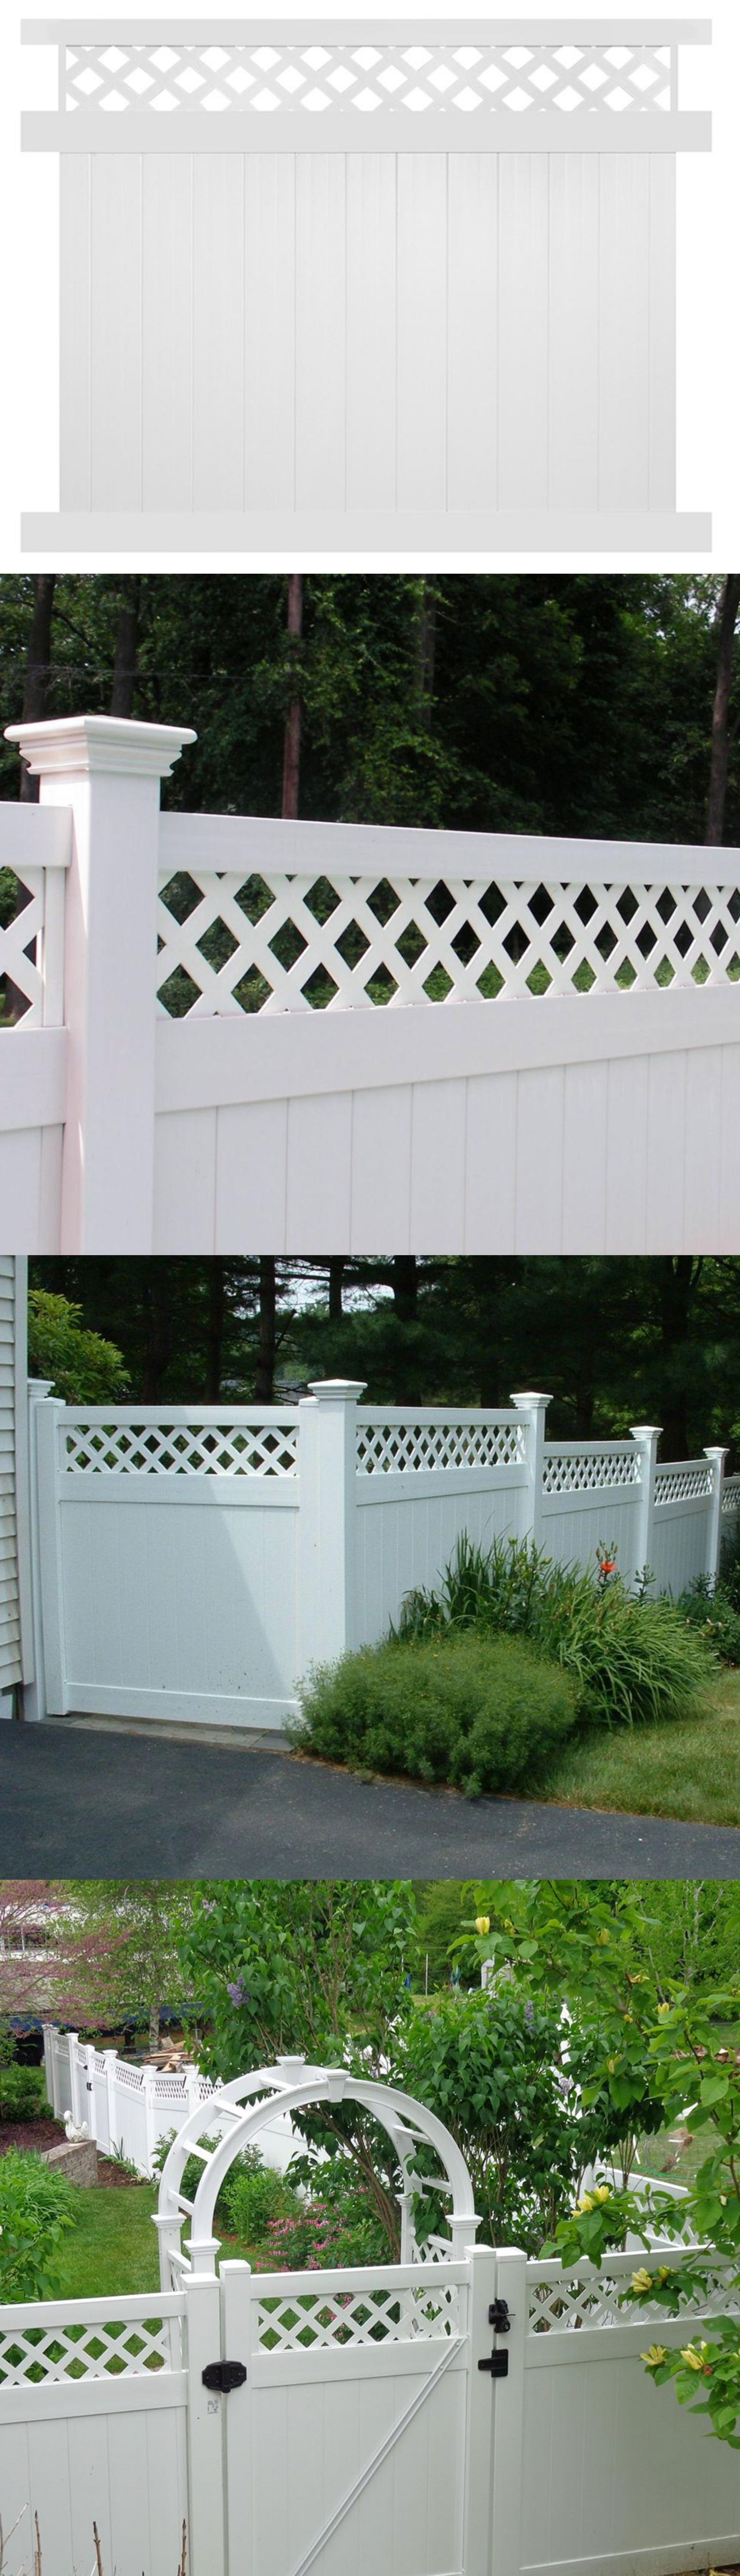 Fence Panels 139946: Vinyl Privacy Fence Panel Kit White 5 X